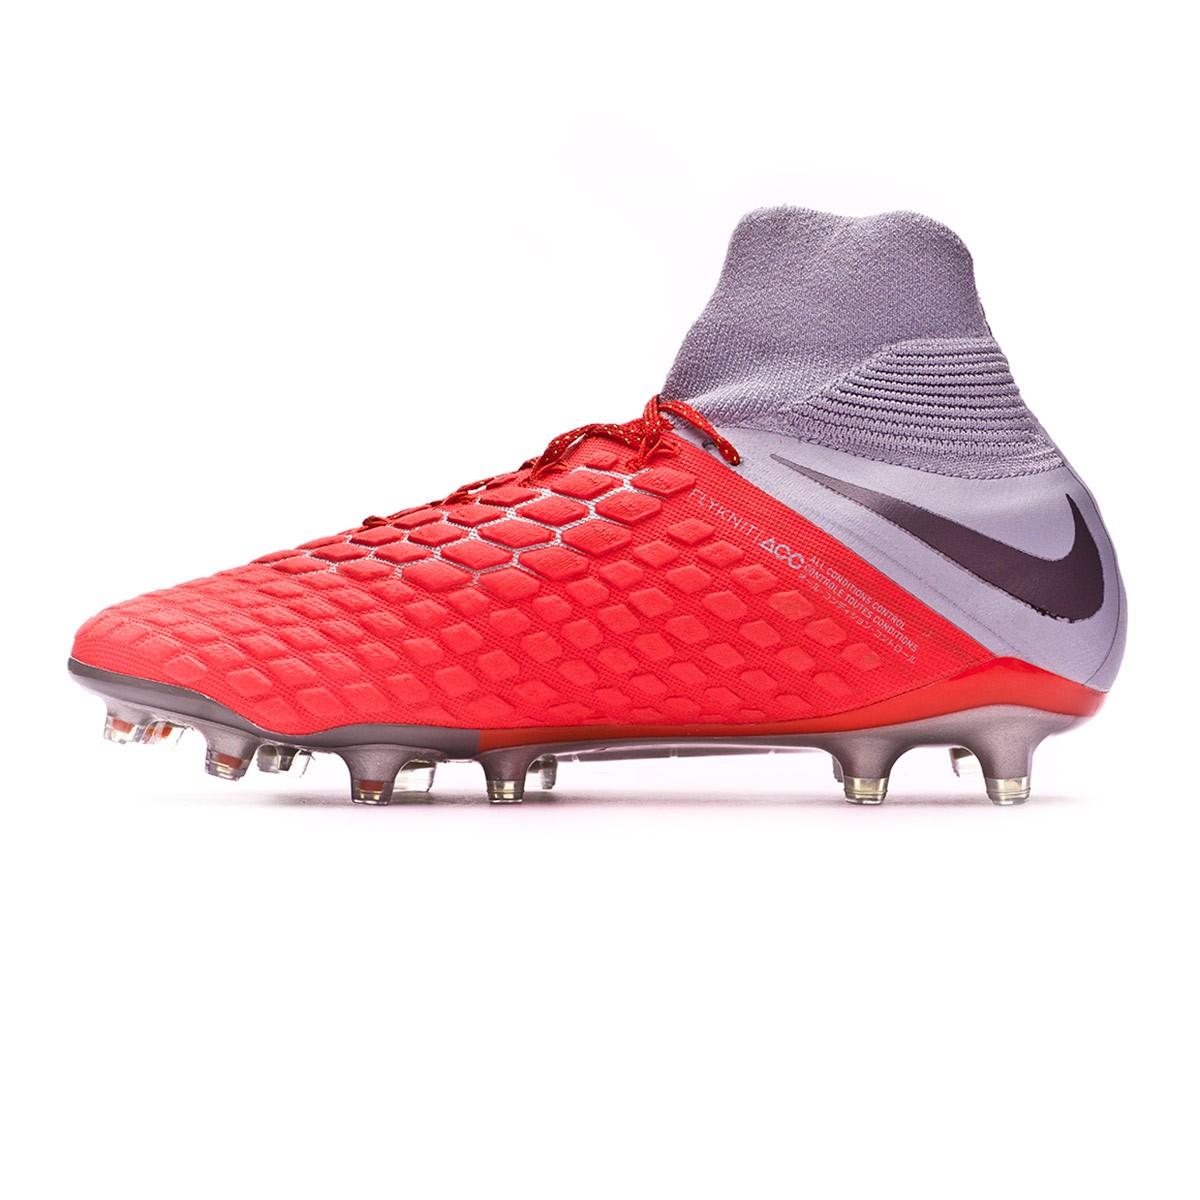 dc0fe8bff Football Boots Nike Hypervenom Phantom III Elite DF FG Light  crimson-Metallic dark grey-Wolf grey - Tienda de fútbol Fútbol Emotion